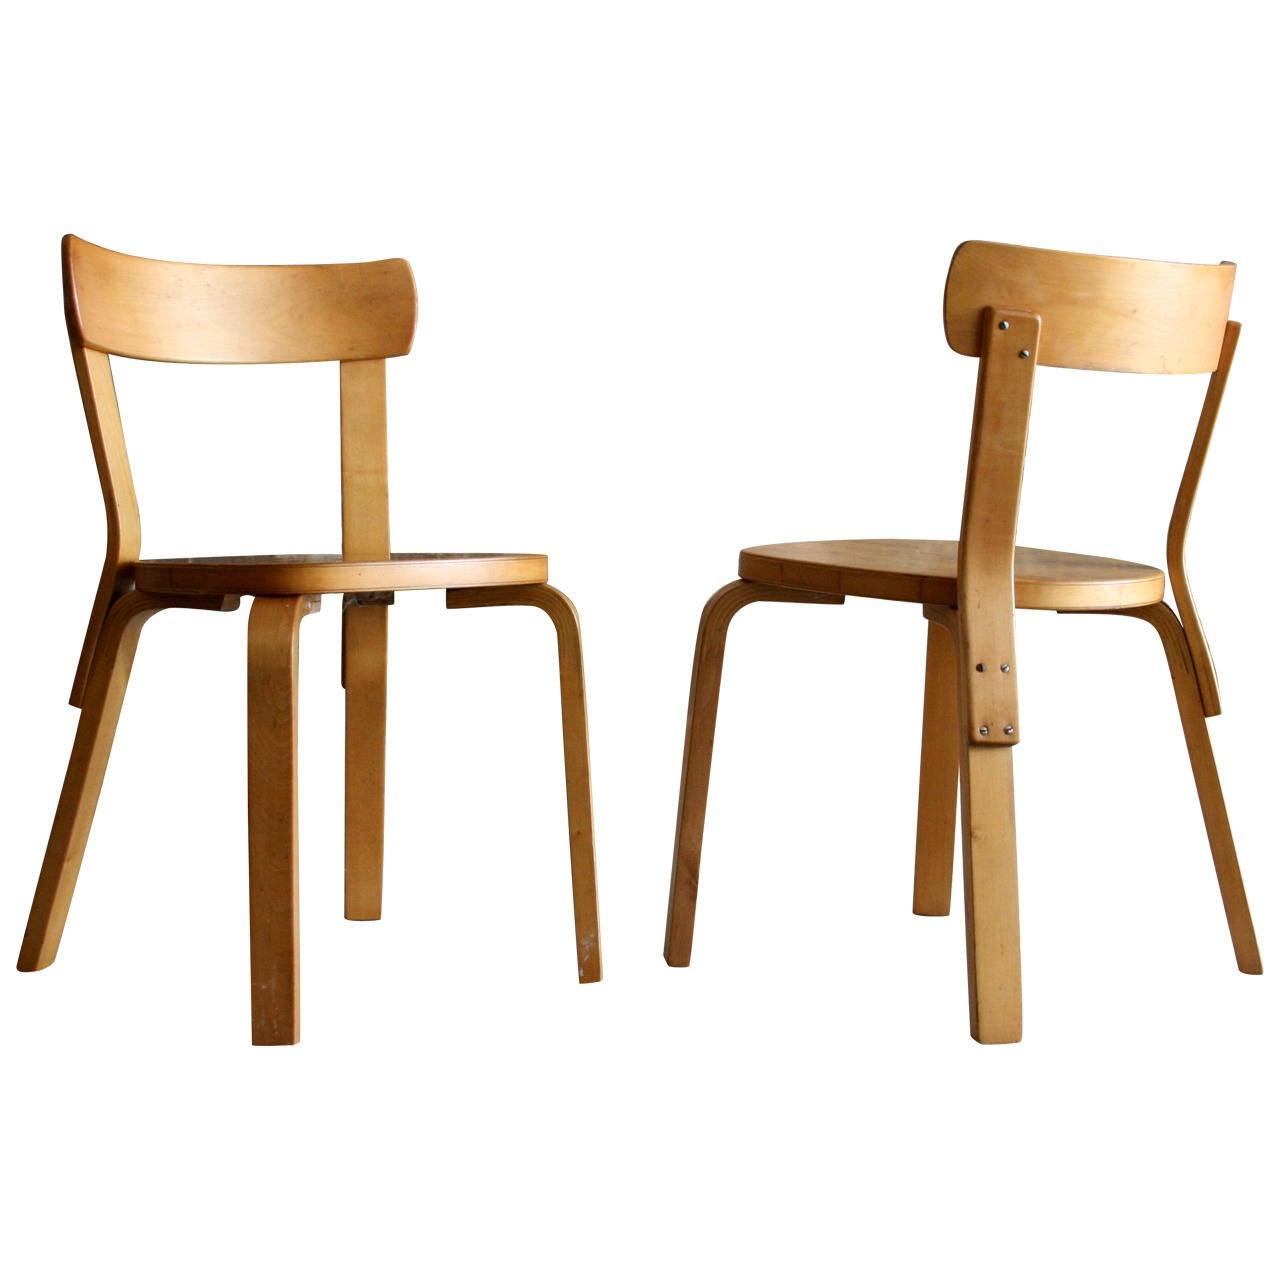 69 Chairs By Alvar Aalto For Artek 1935 For Sale